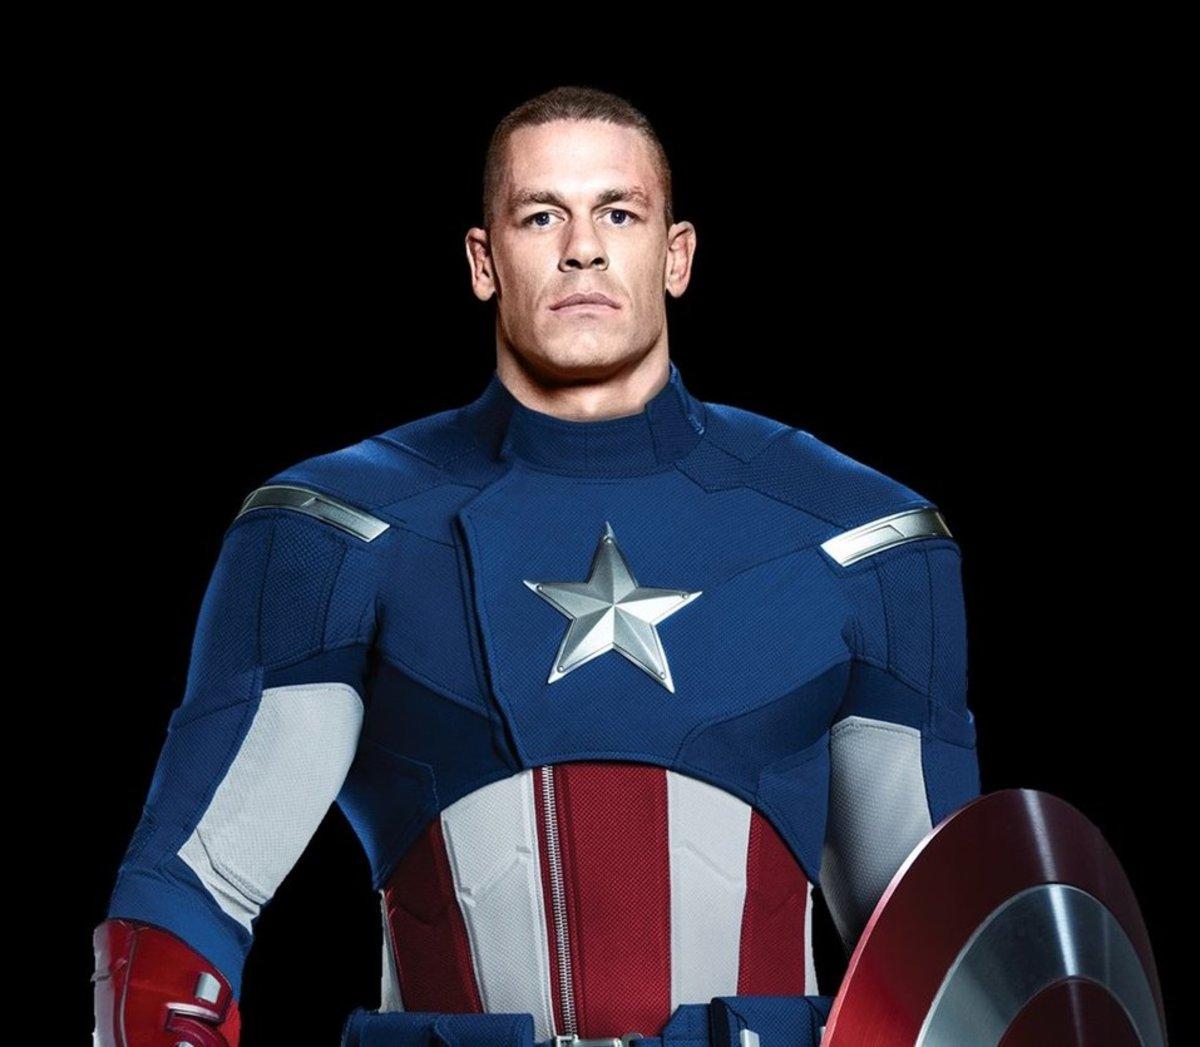 All American hero John Cena as Captain America.